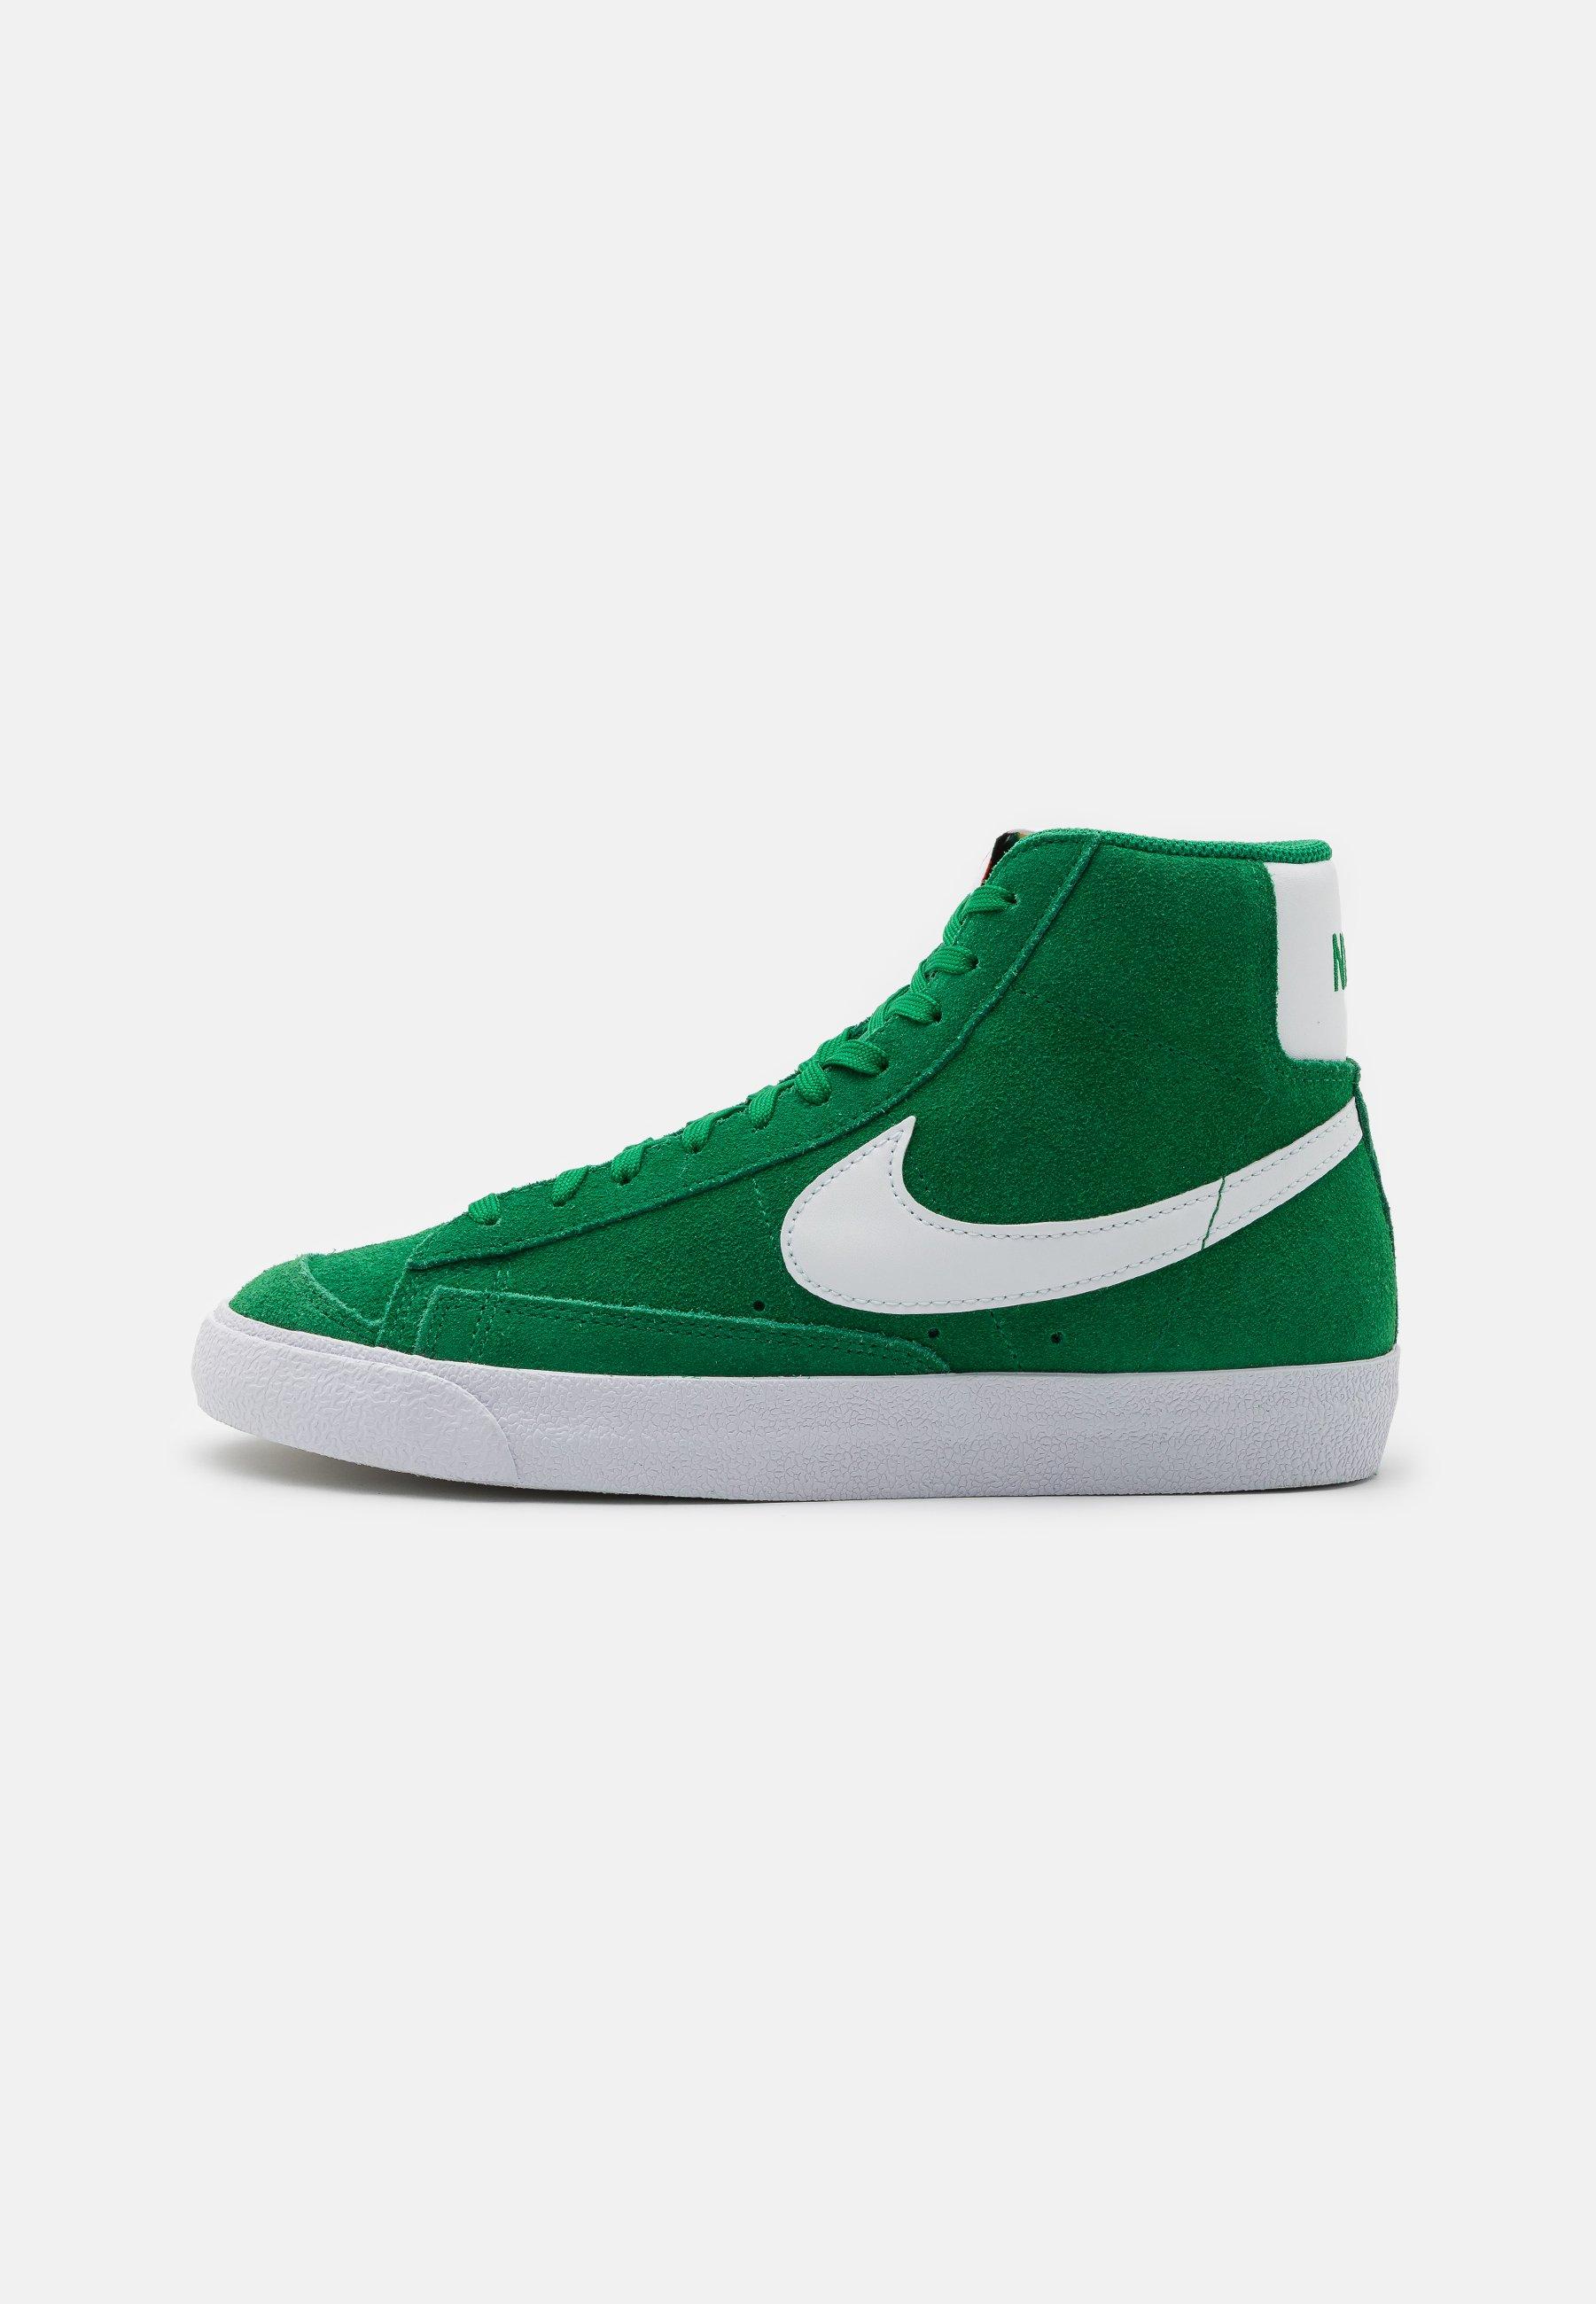 BLAZER MID '77 UNISEX - Baskets montantes - pine green/white/black/team orange